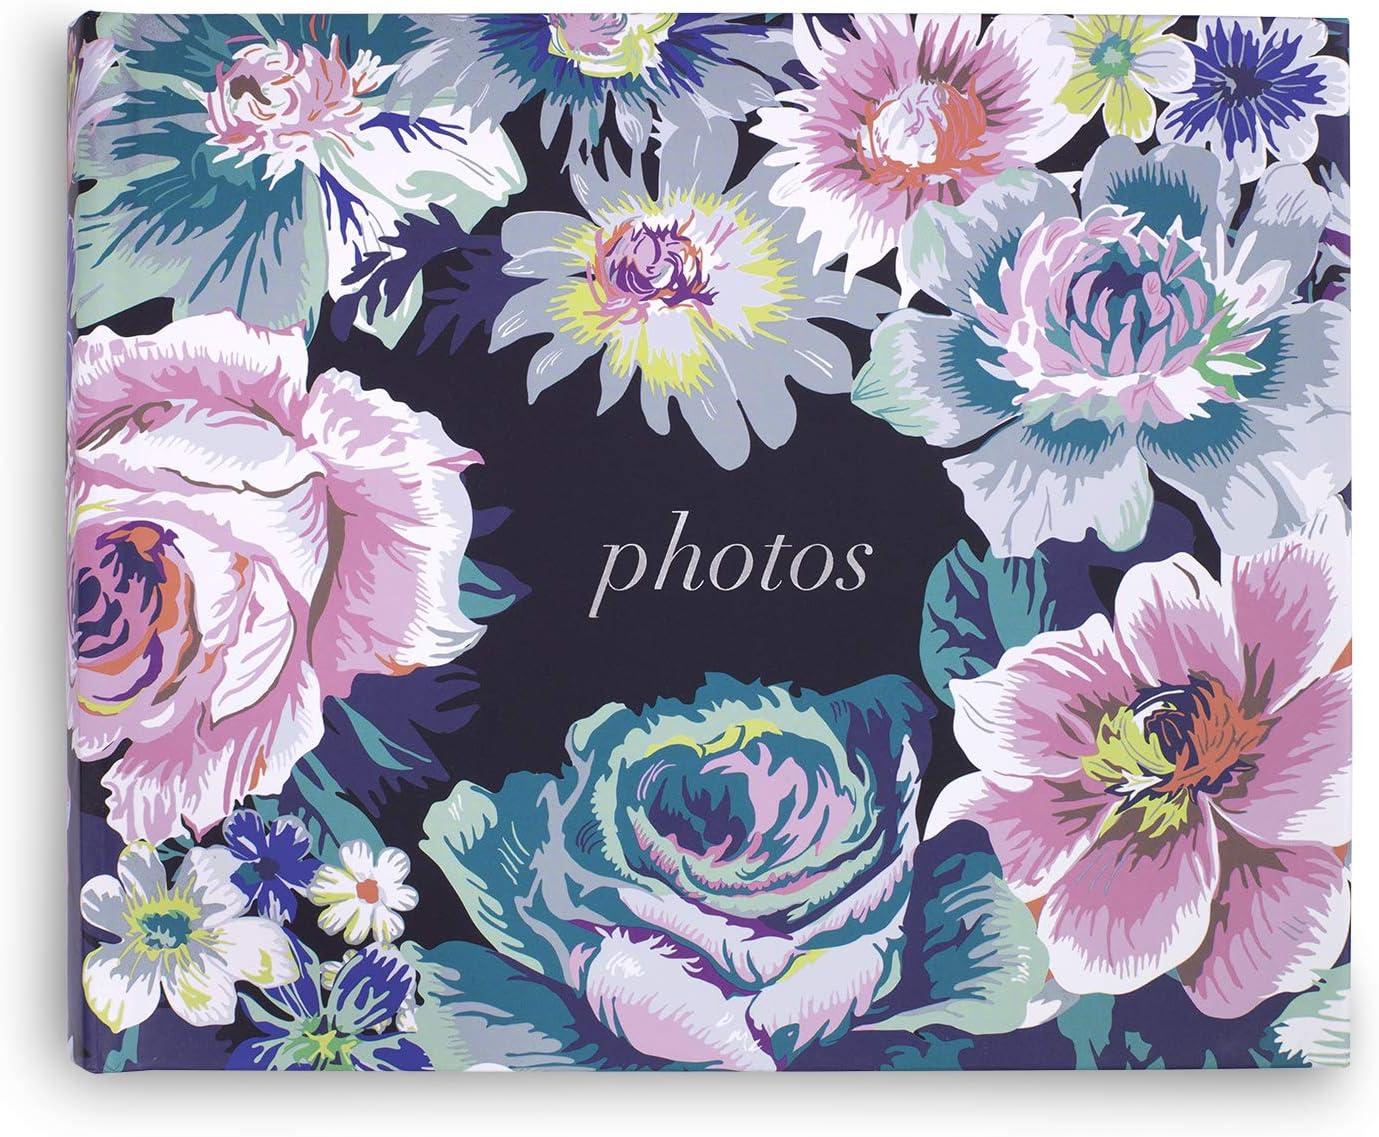 "Vera Bradley Pretty Floral Photo Album, Family Picture Book Holds 70 Photographs Size 4"" x 6"", Garden Grove"